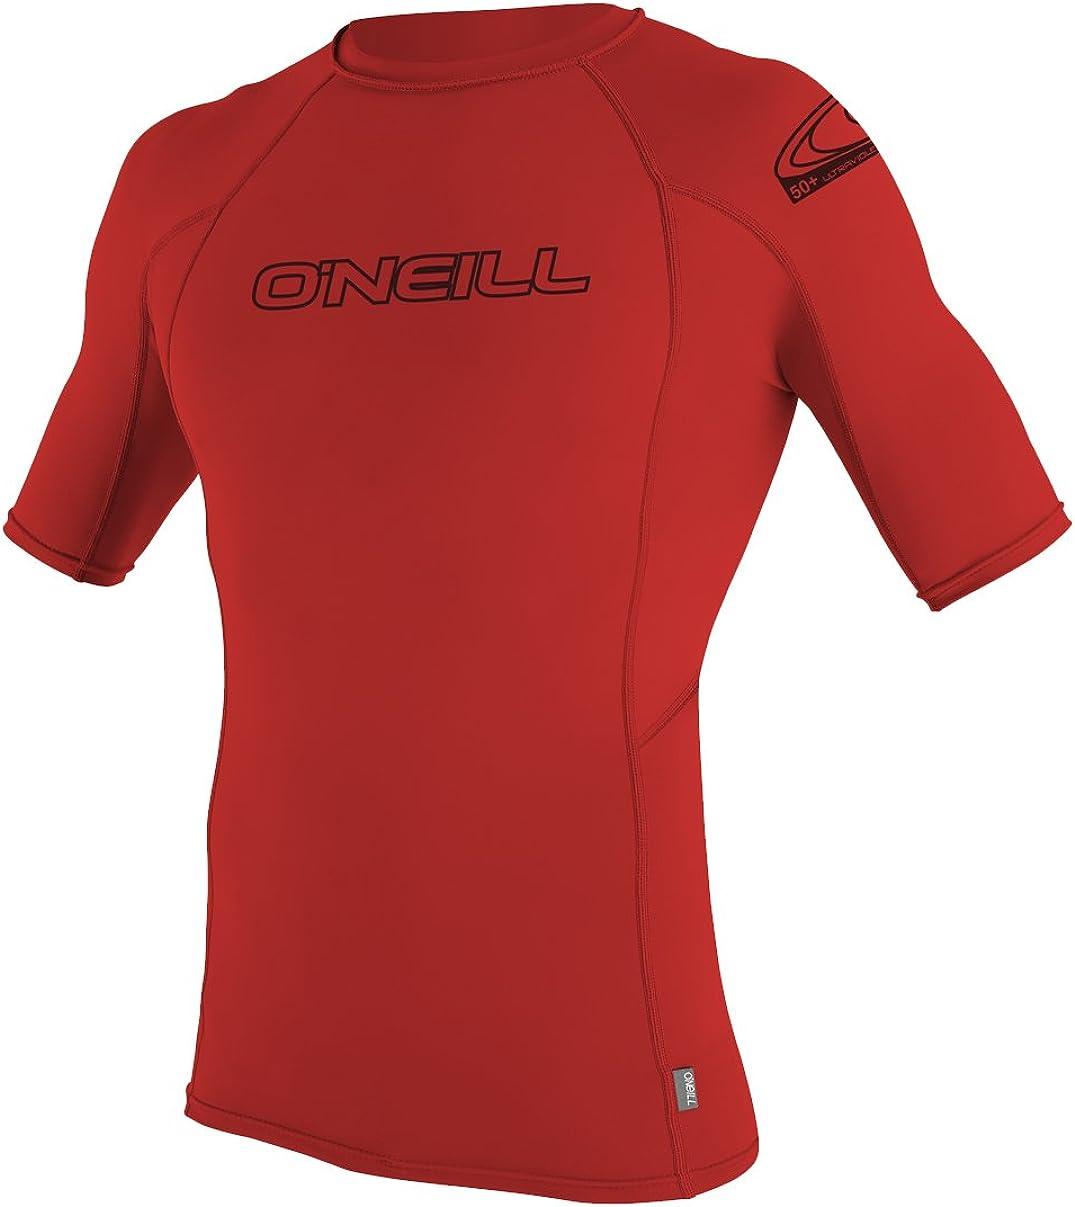 O'Neill Wetsuits Kids' Youth Basic Skins 50+ S/S Sun Shirt